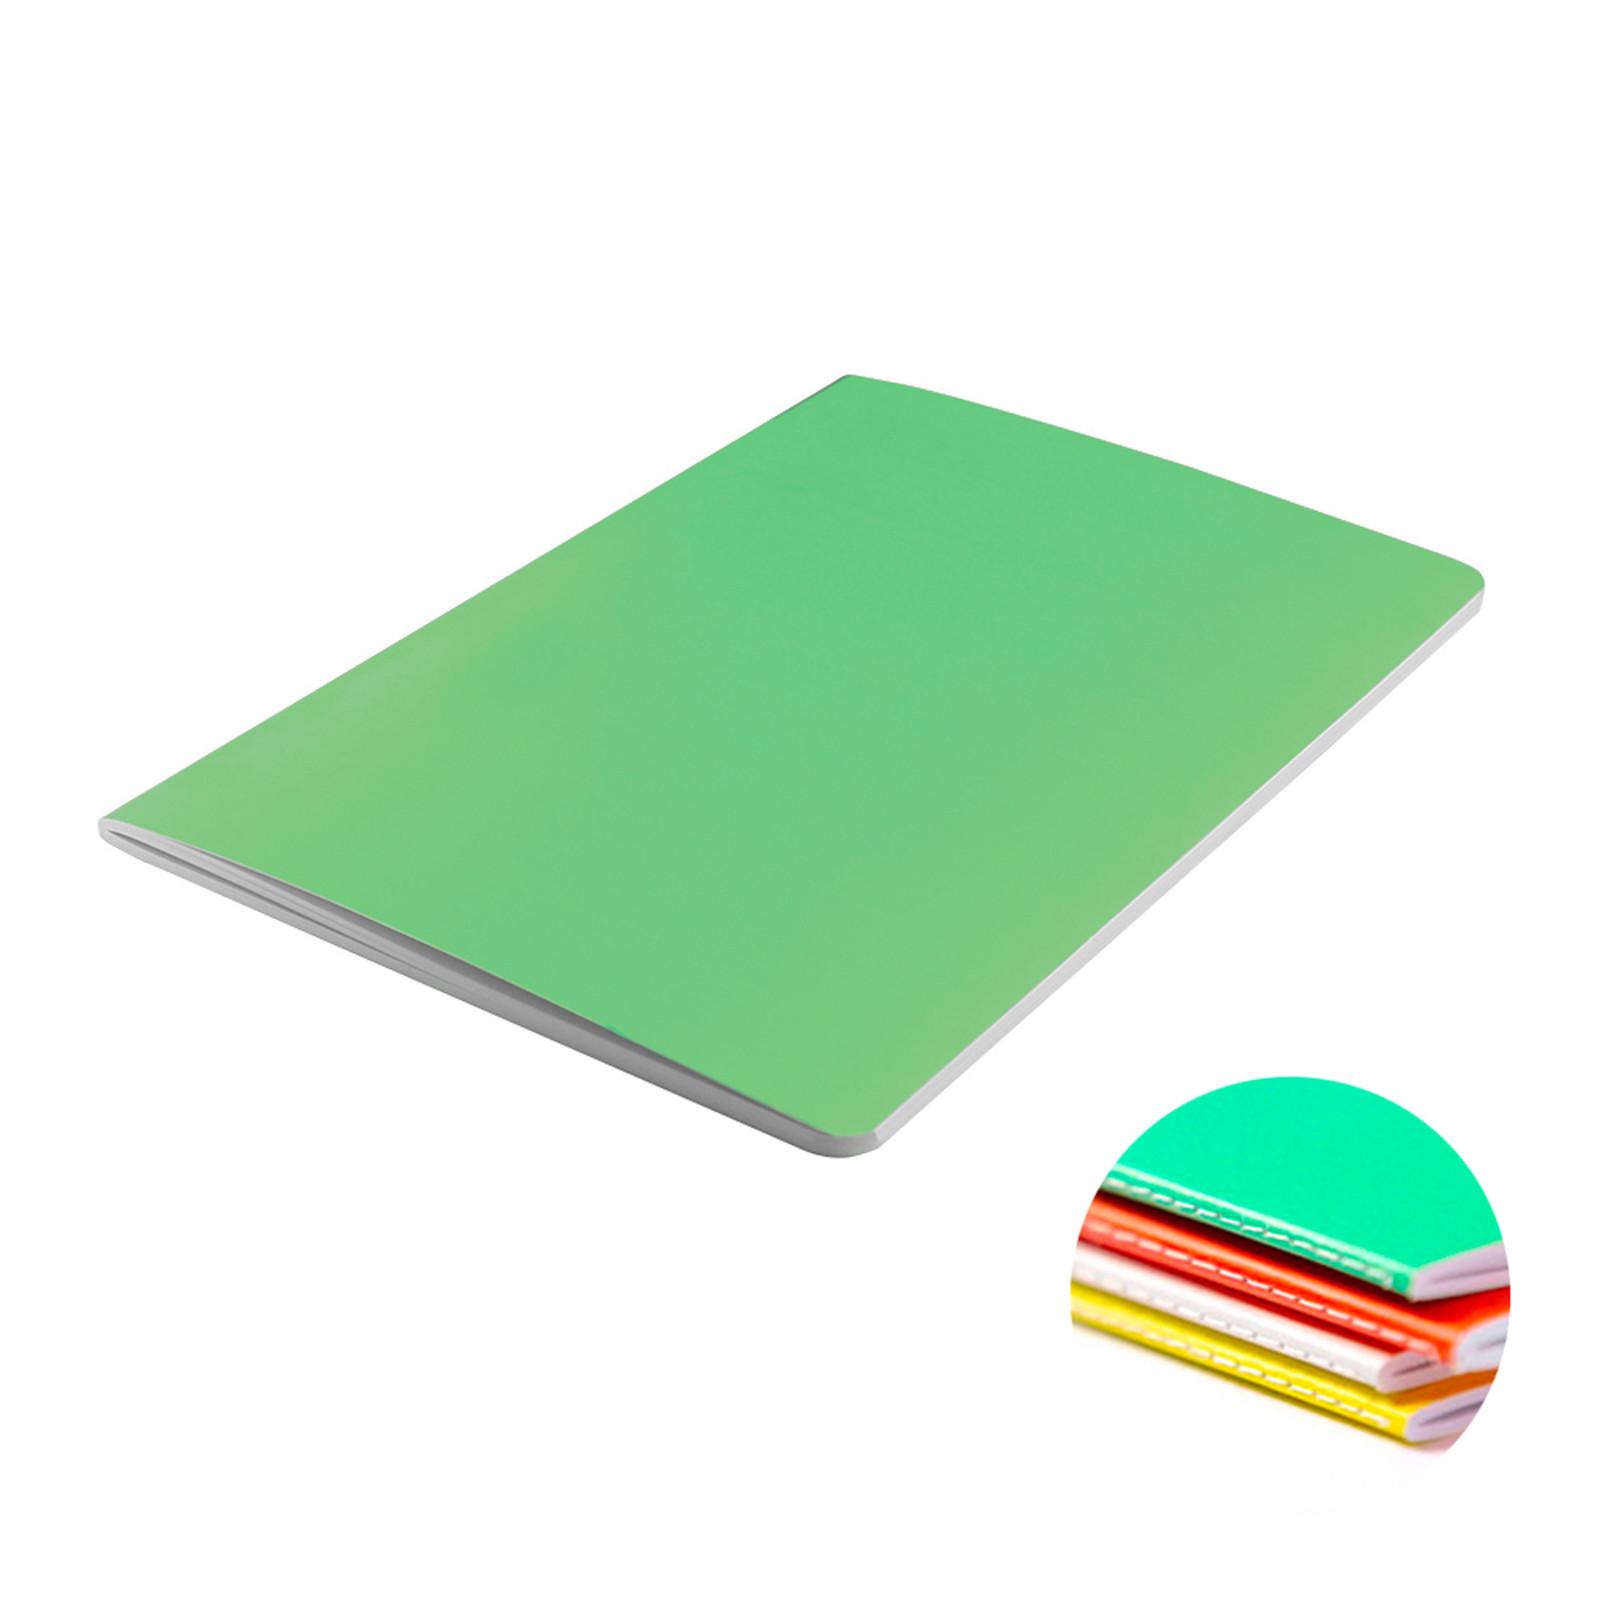 Colornote A5 - Verde Pistachio